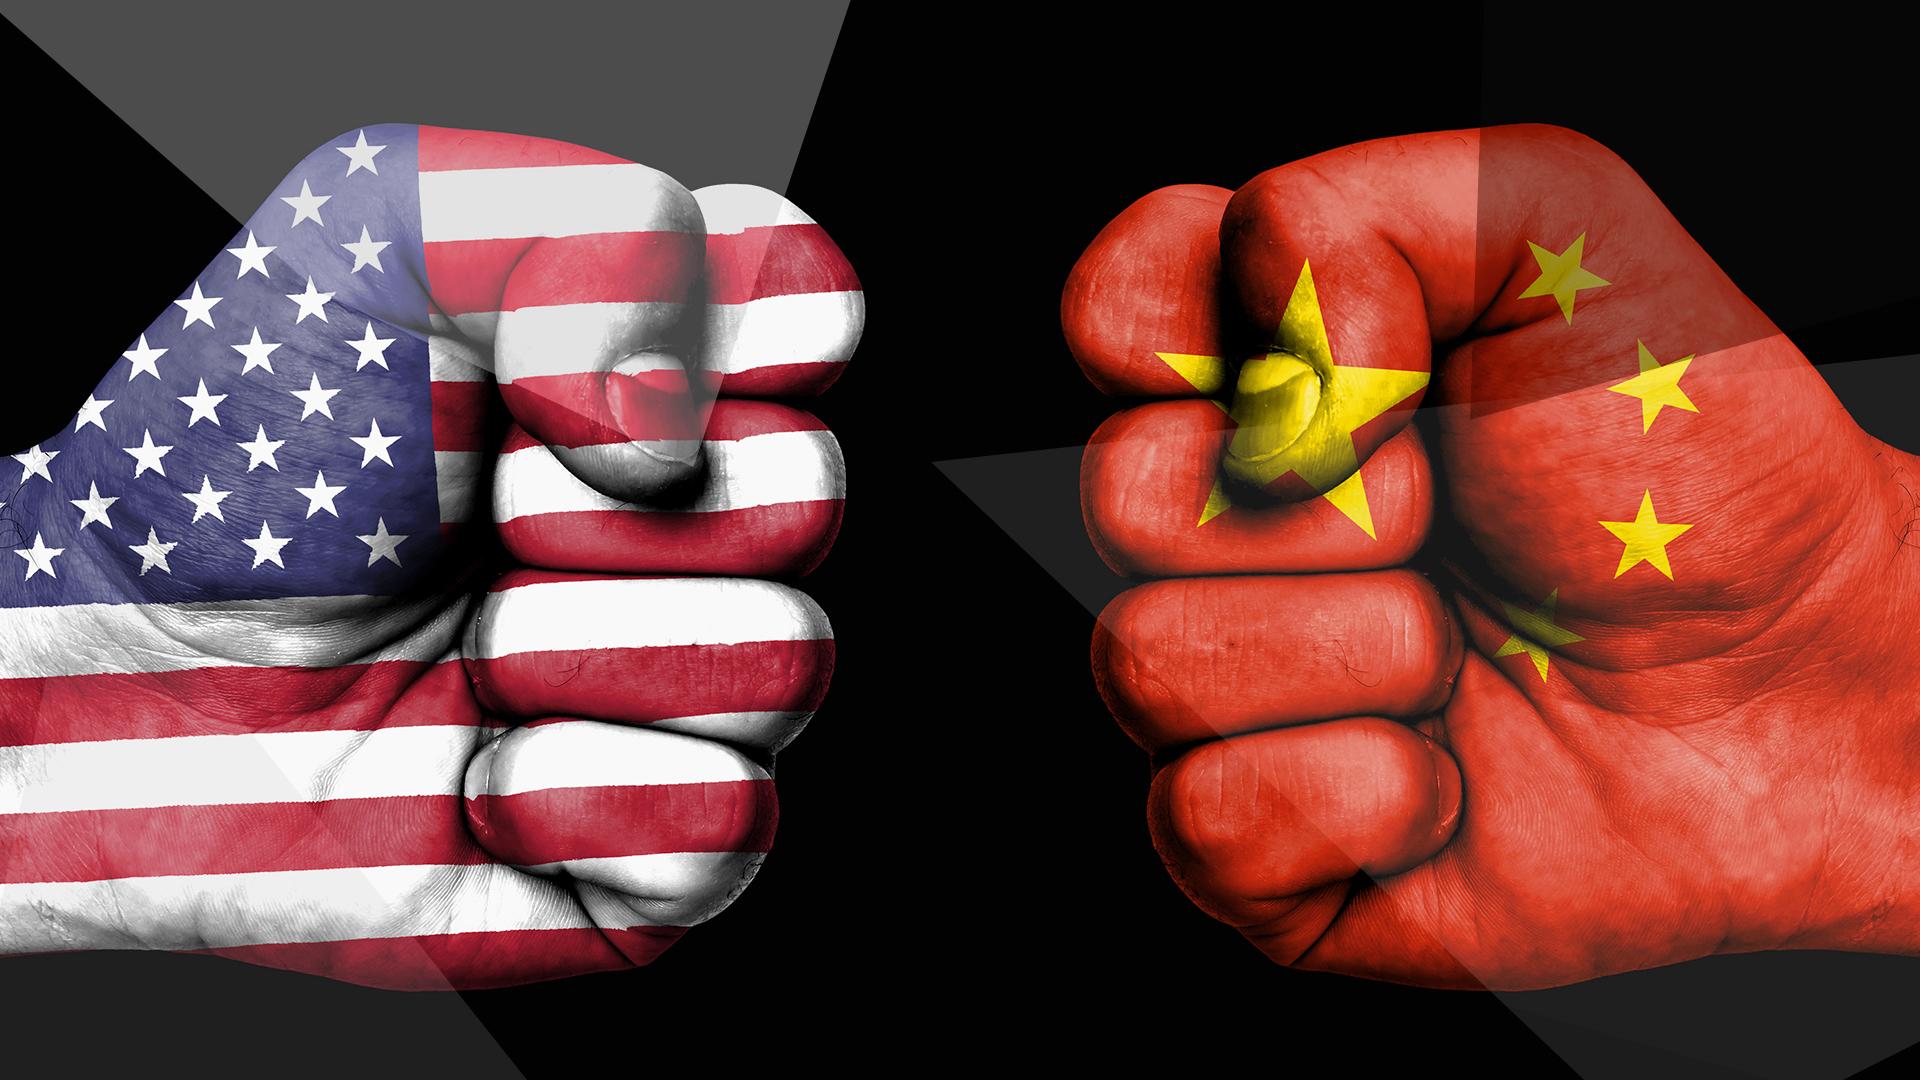 Usa, Huawei, China, Handel, Sanktionen, Handelskrieg, Versus, Fahne, Handelsverbot, vs., VS, US, America, flag, Huawei vs. USA, Huawei versus USA, China vs. USA, USA vs. China, Handelsstreit, Chinesisch, Handelsabkommen, Trade, Faust, Boxer, Fist